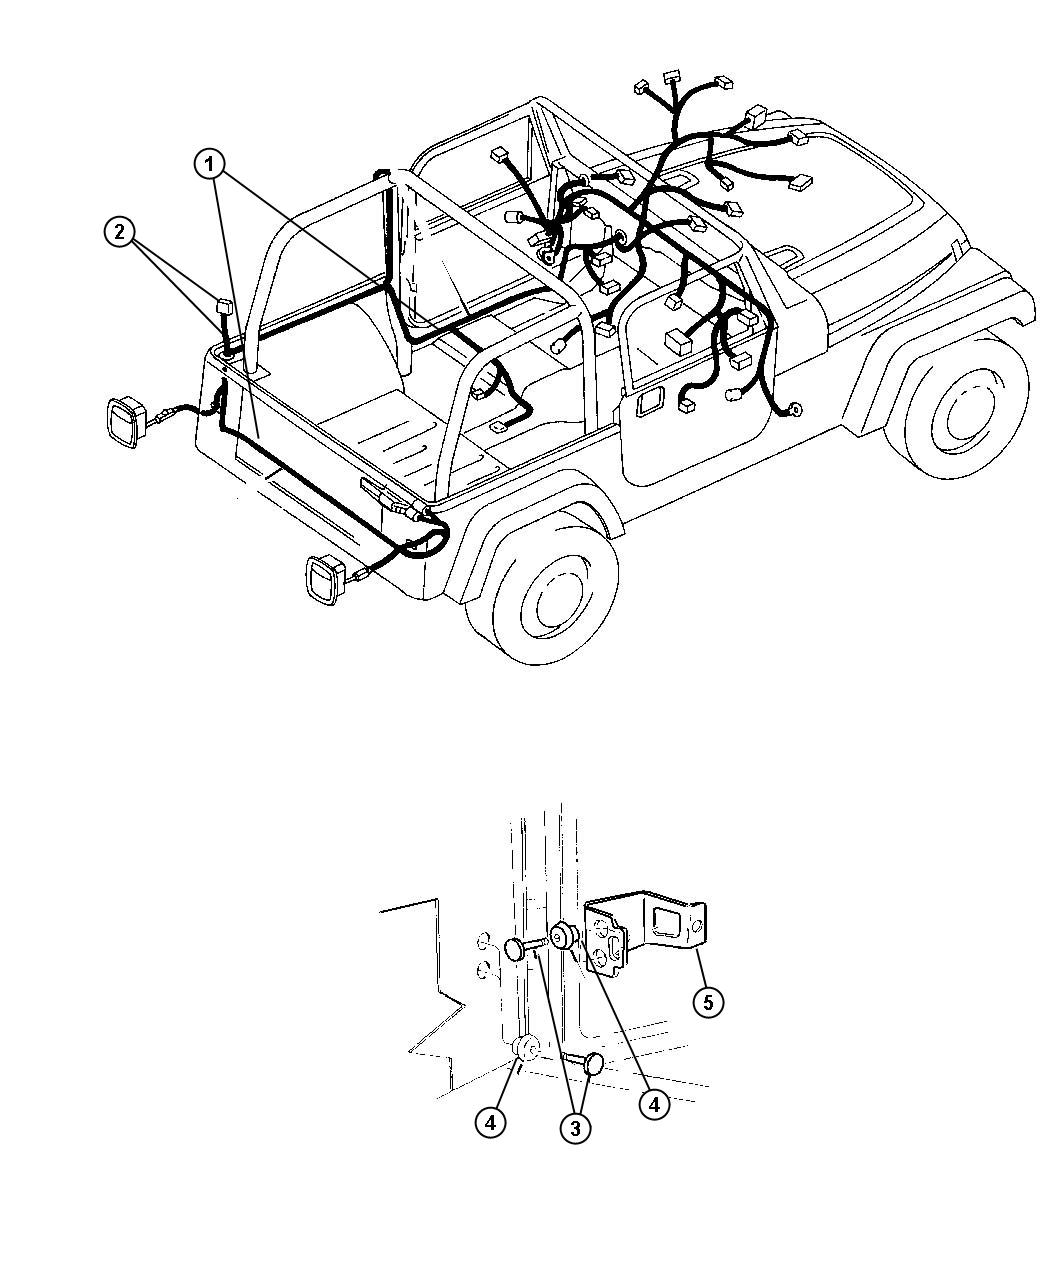 Jeep Wrangler Wiring Hardtop